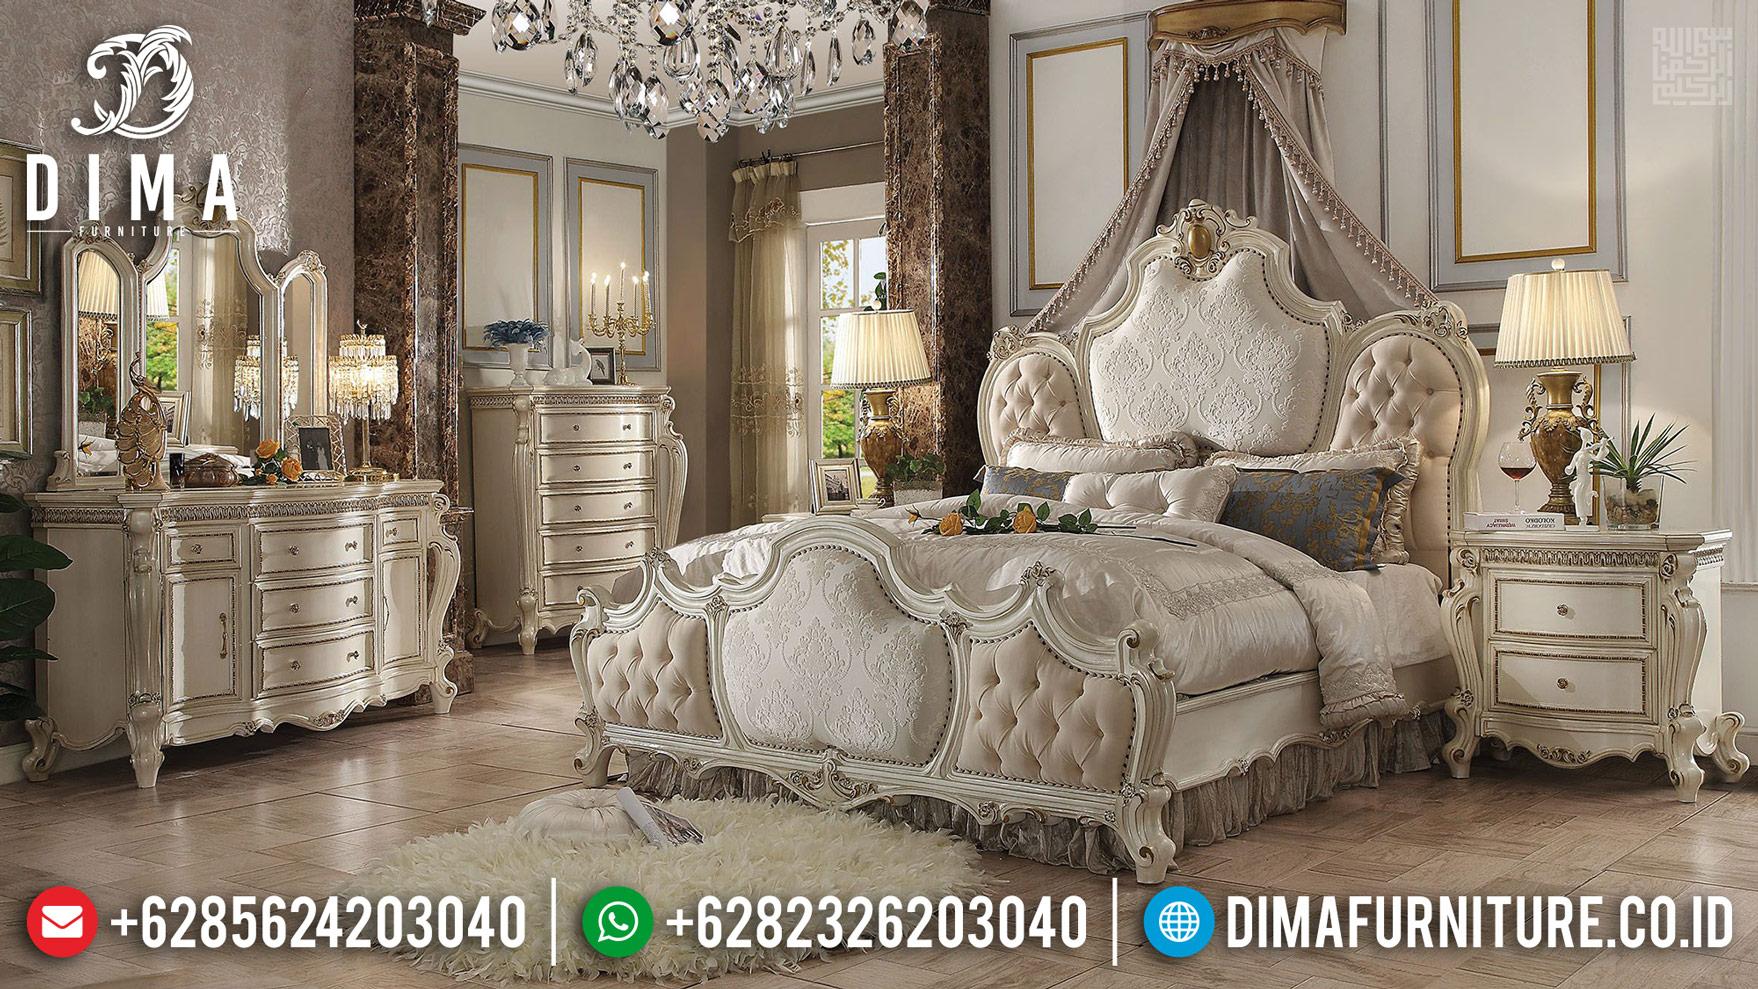 New Tempat Tidur Mewah, Bedroom Sets Luxury, Set Kamar Tidur Furniture Jepara TTJ-0430